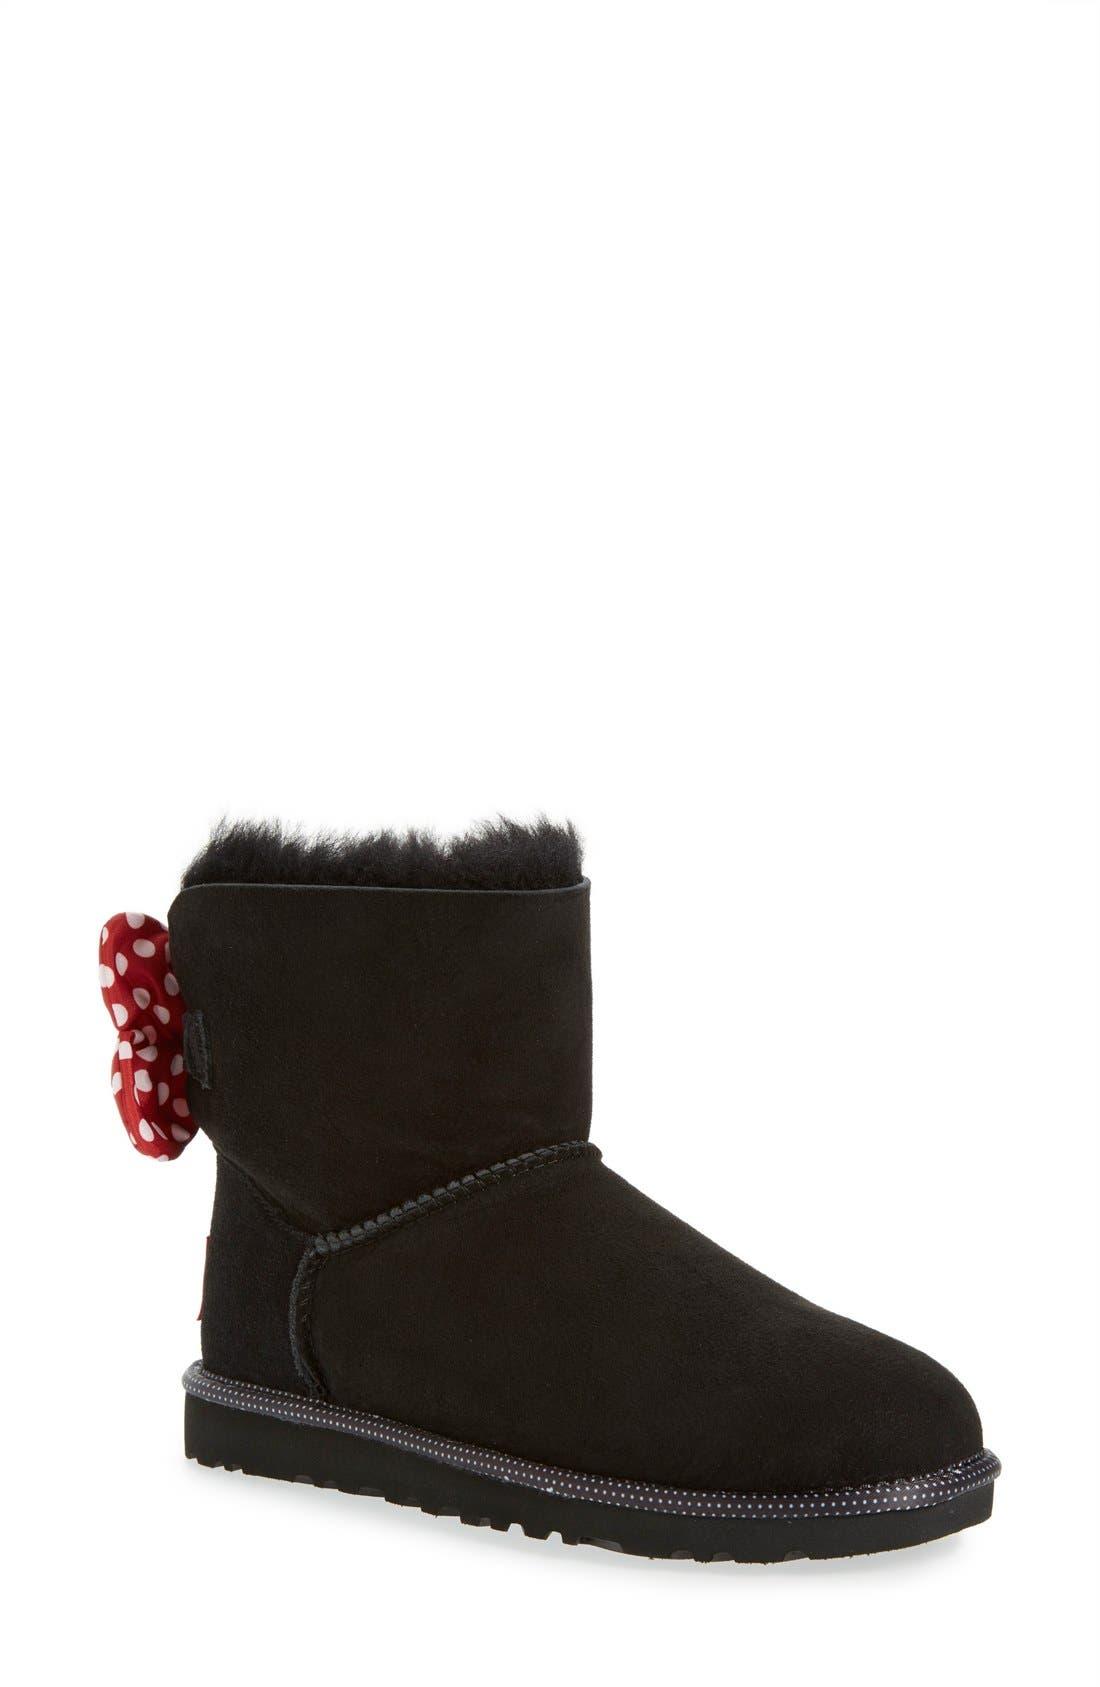 Main Image - UGG® Disney® 'Sweetie Bow' Boot (Women)